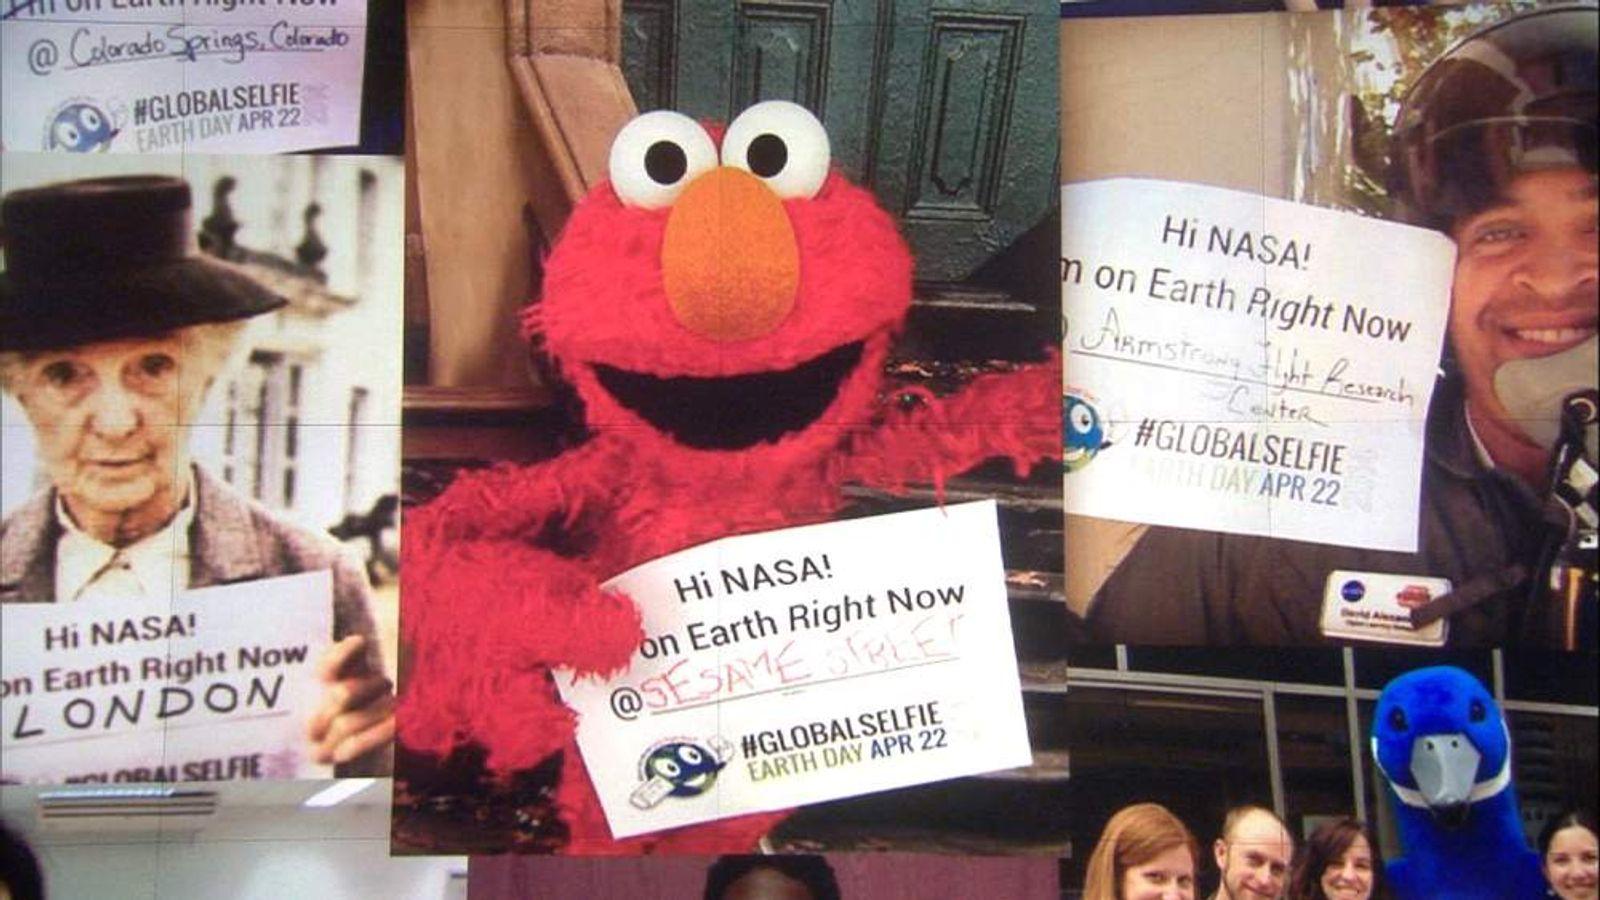 230414 SUNRISE NASA SELFIES WALL